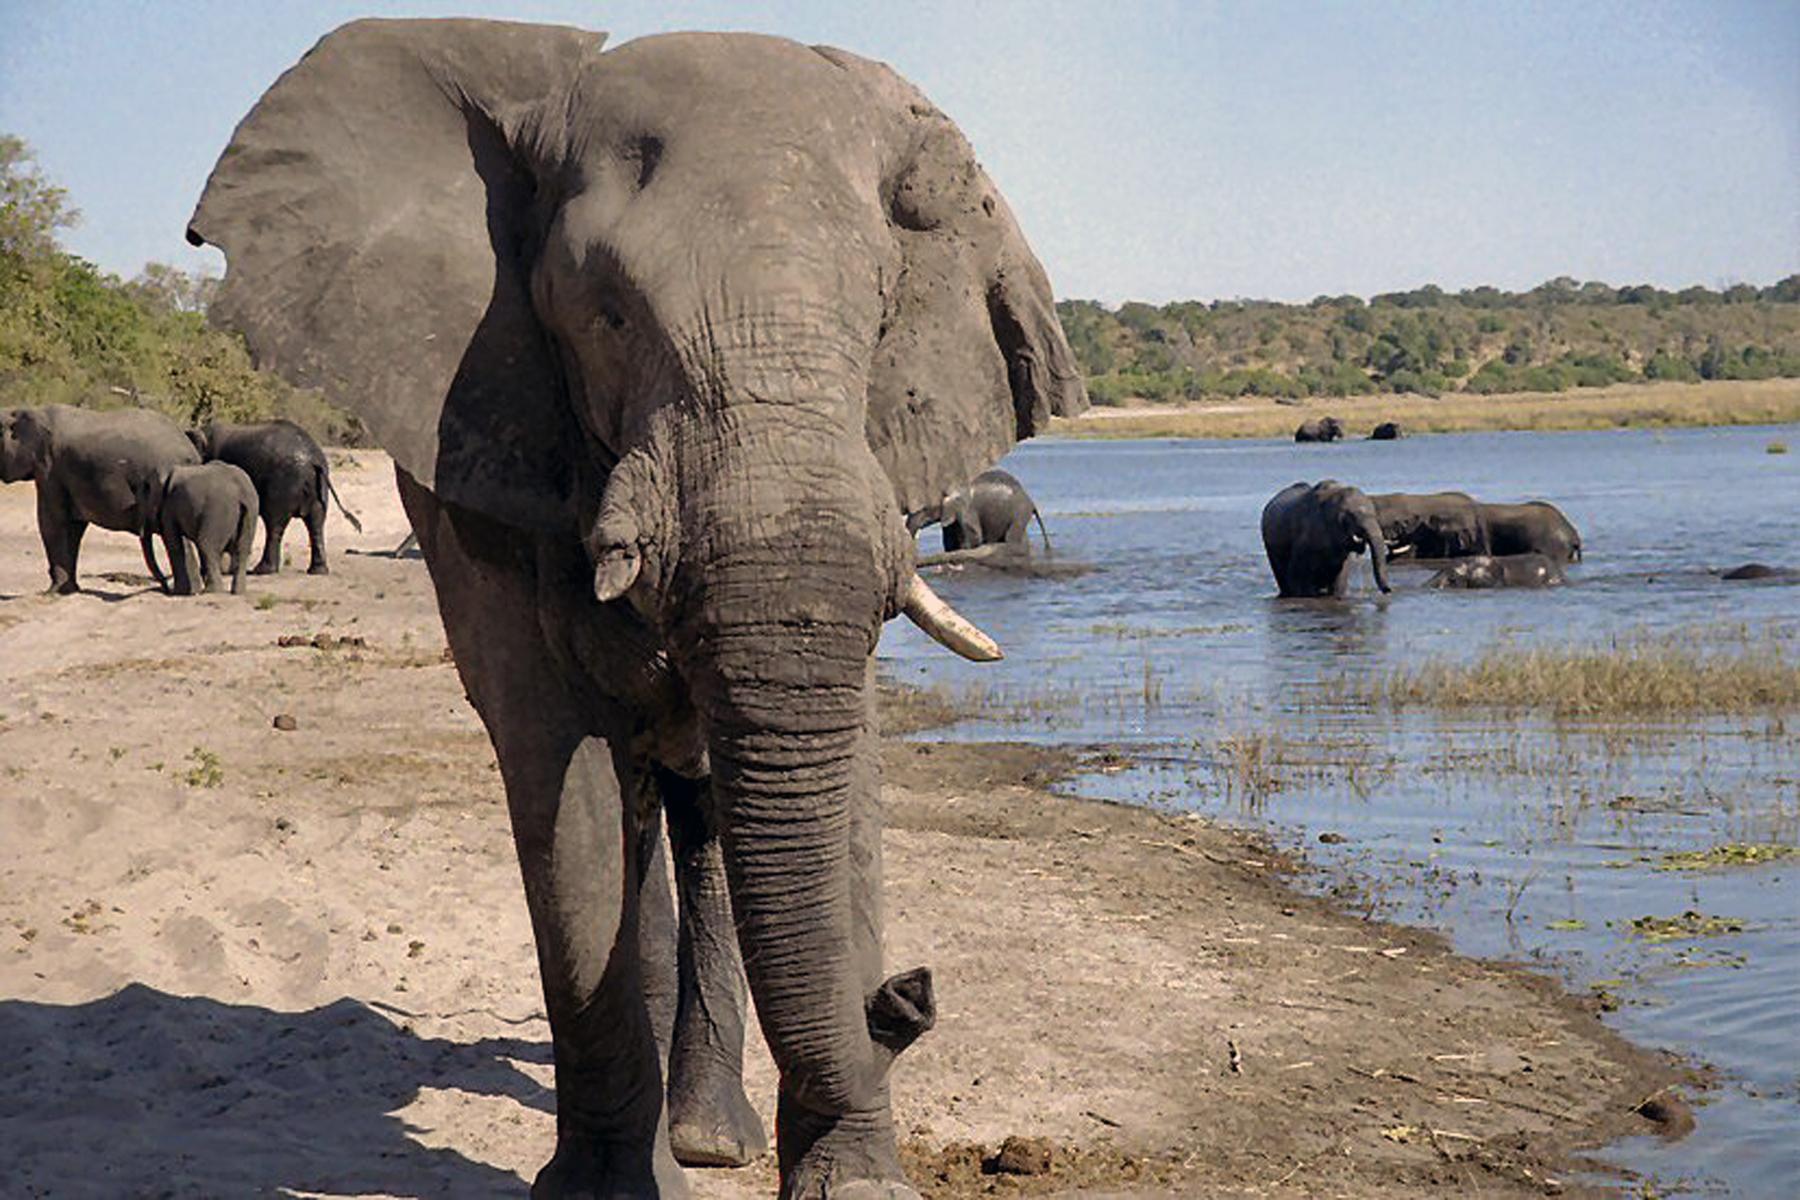 Sth Africa Elephants Bathing